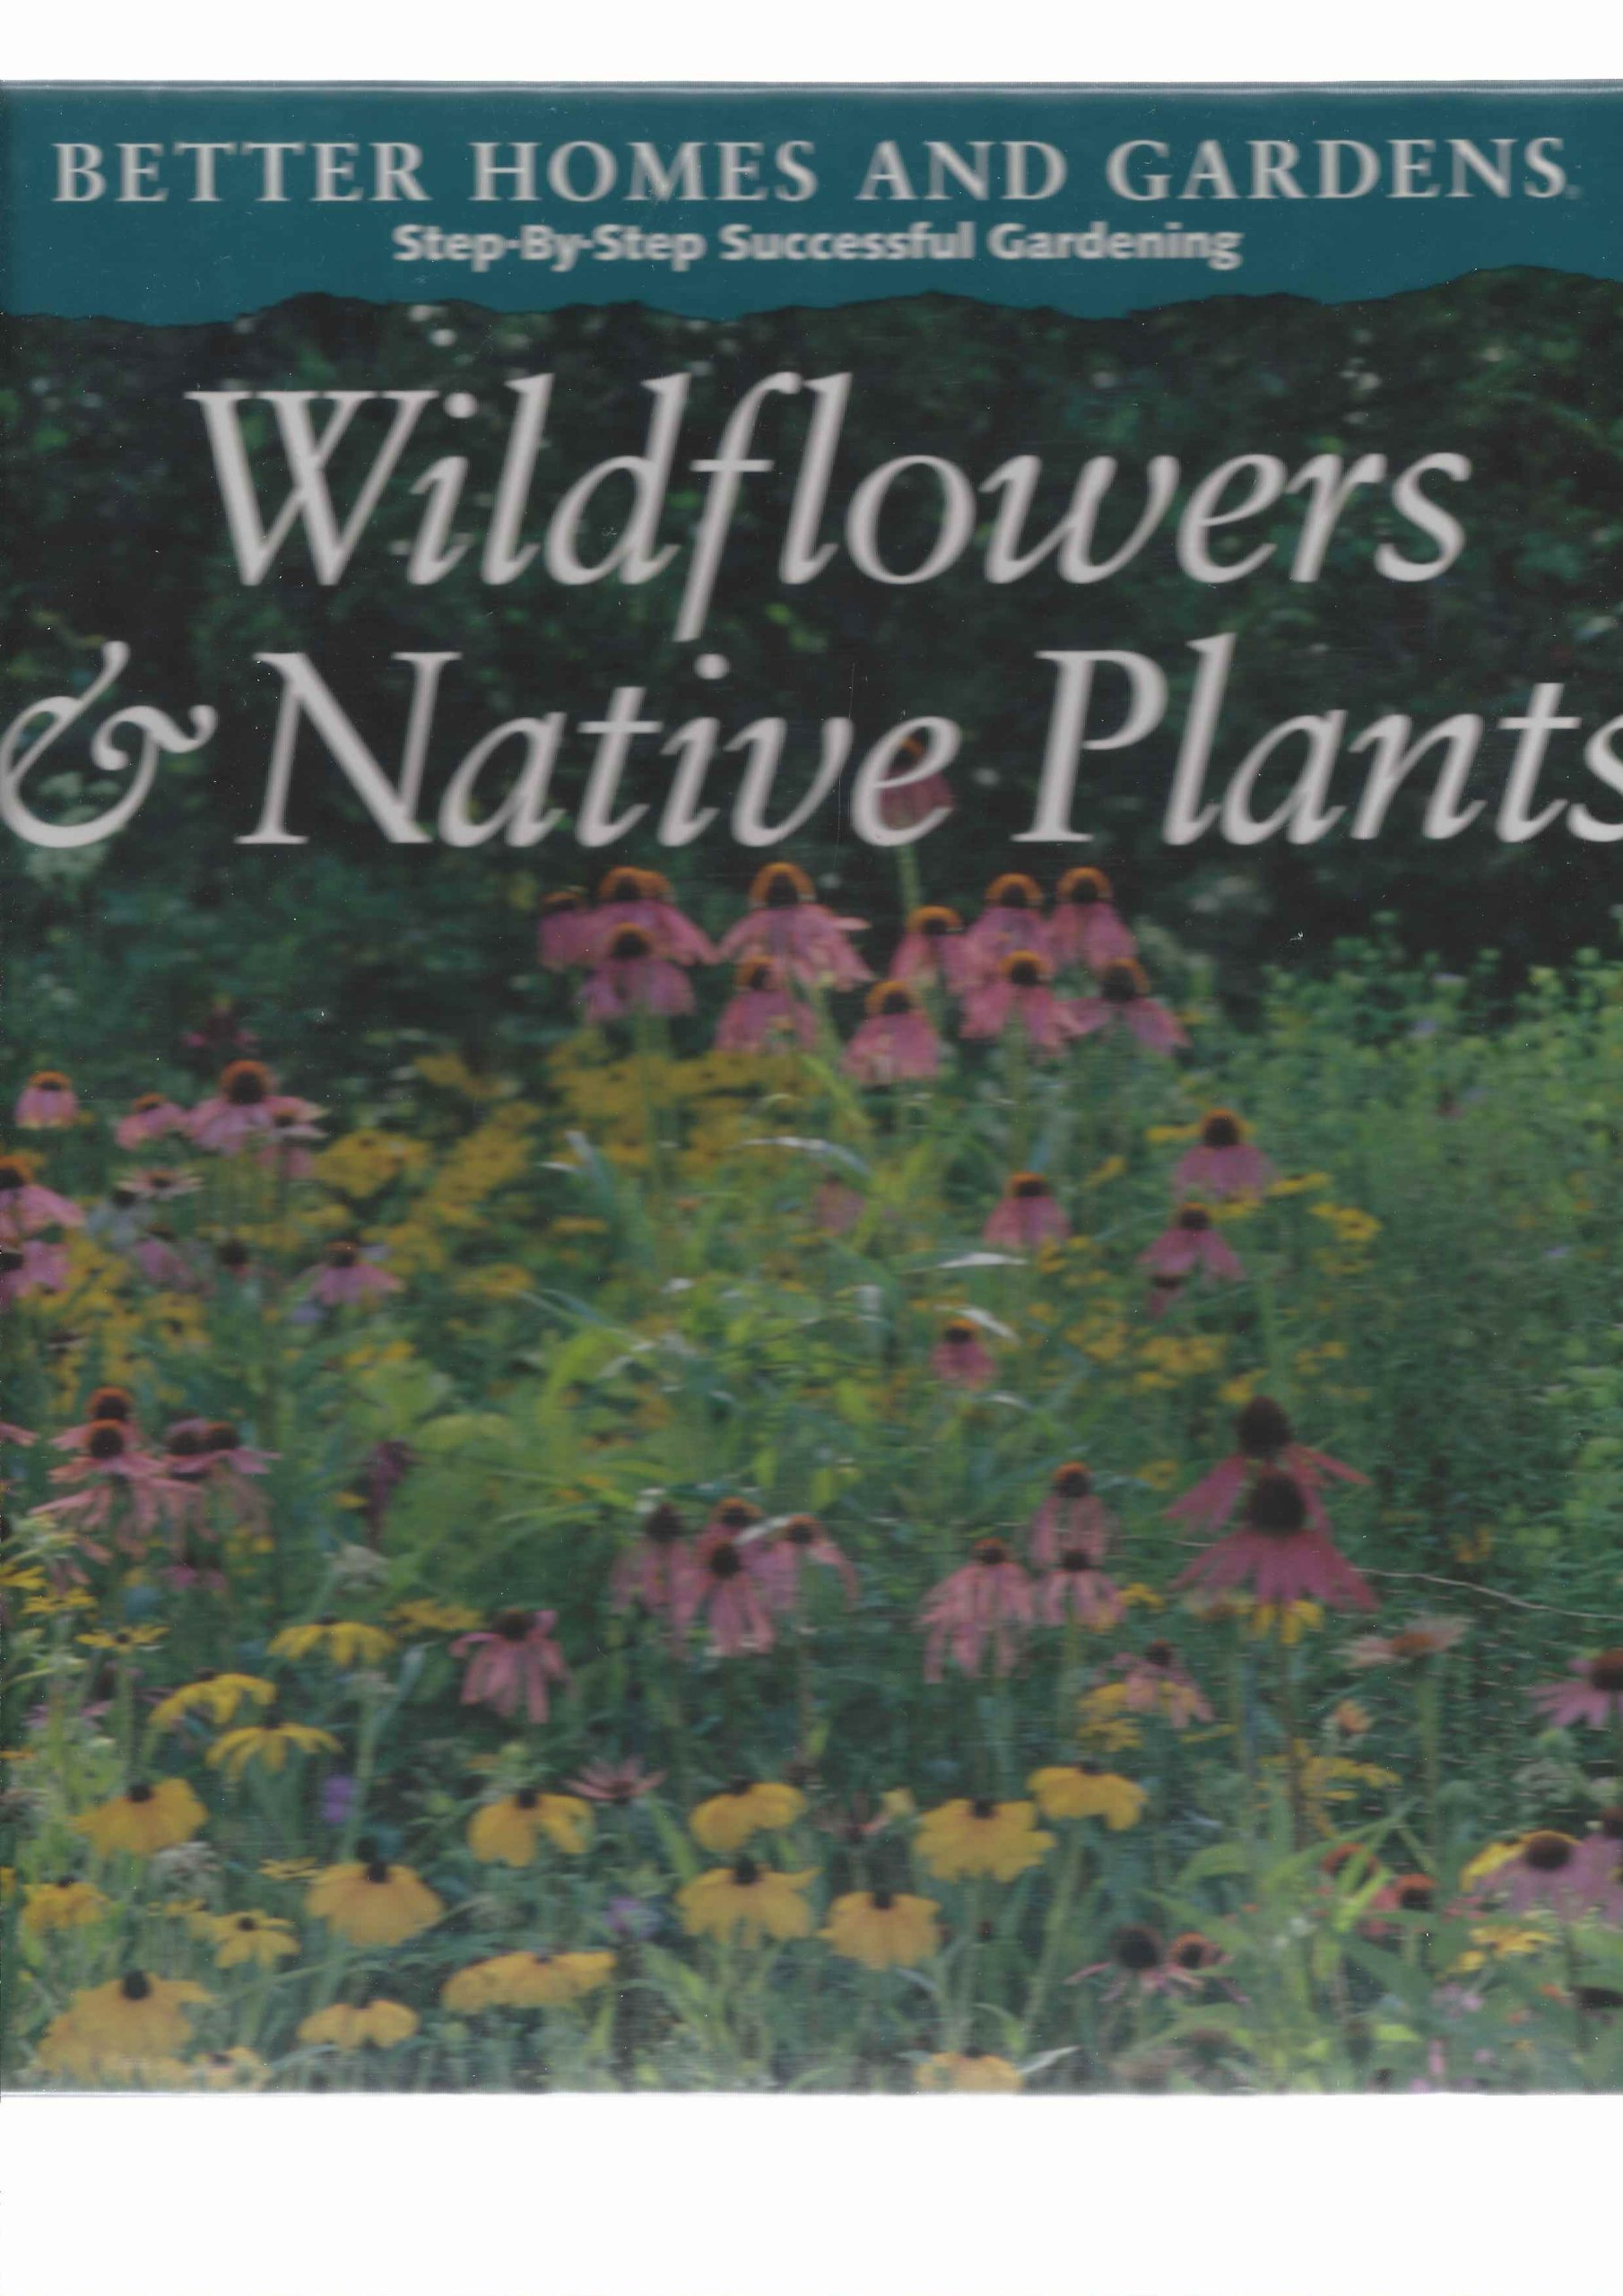 Wildflowers & Native Plants